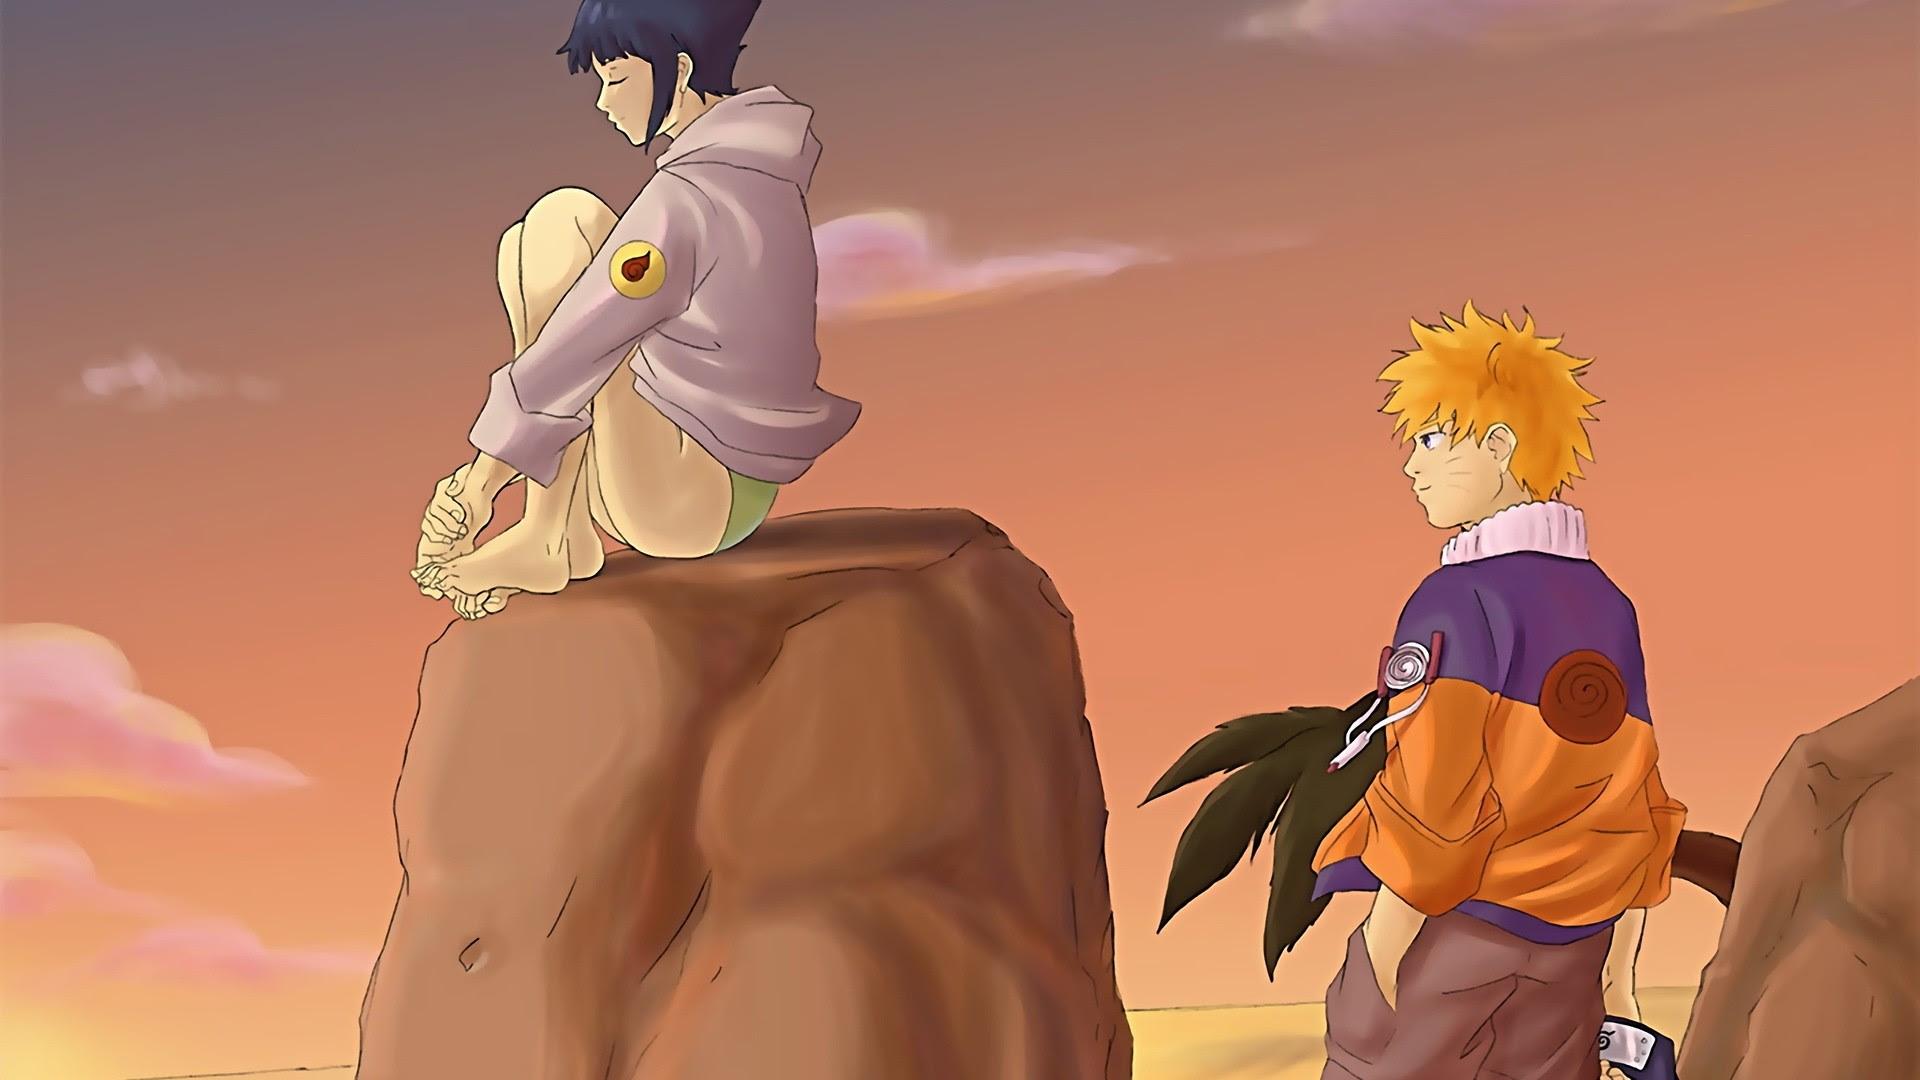 Wallpaper Romantis Anime Naruto Wallpaper Of Anime